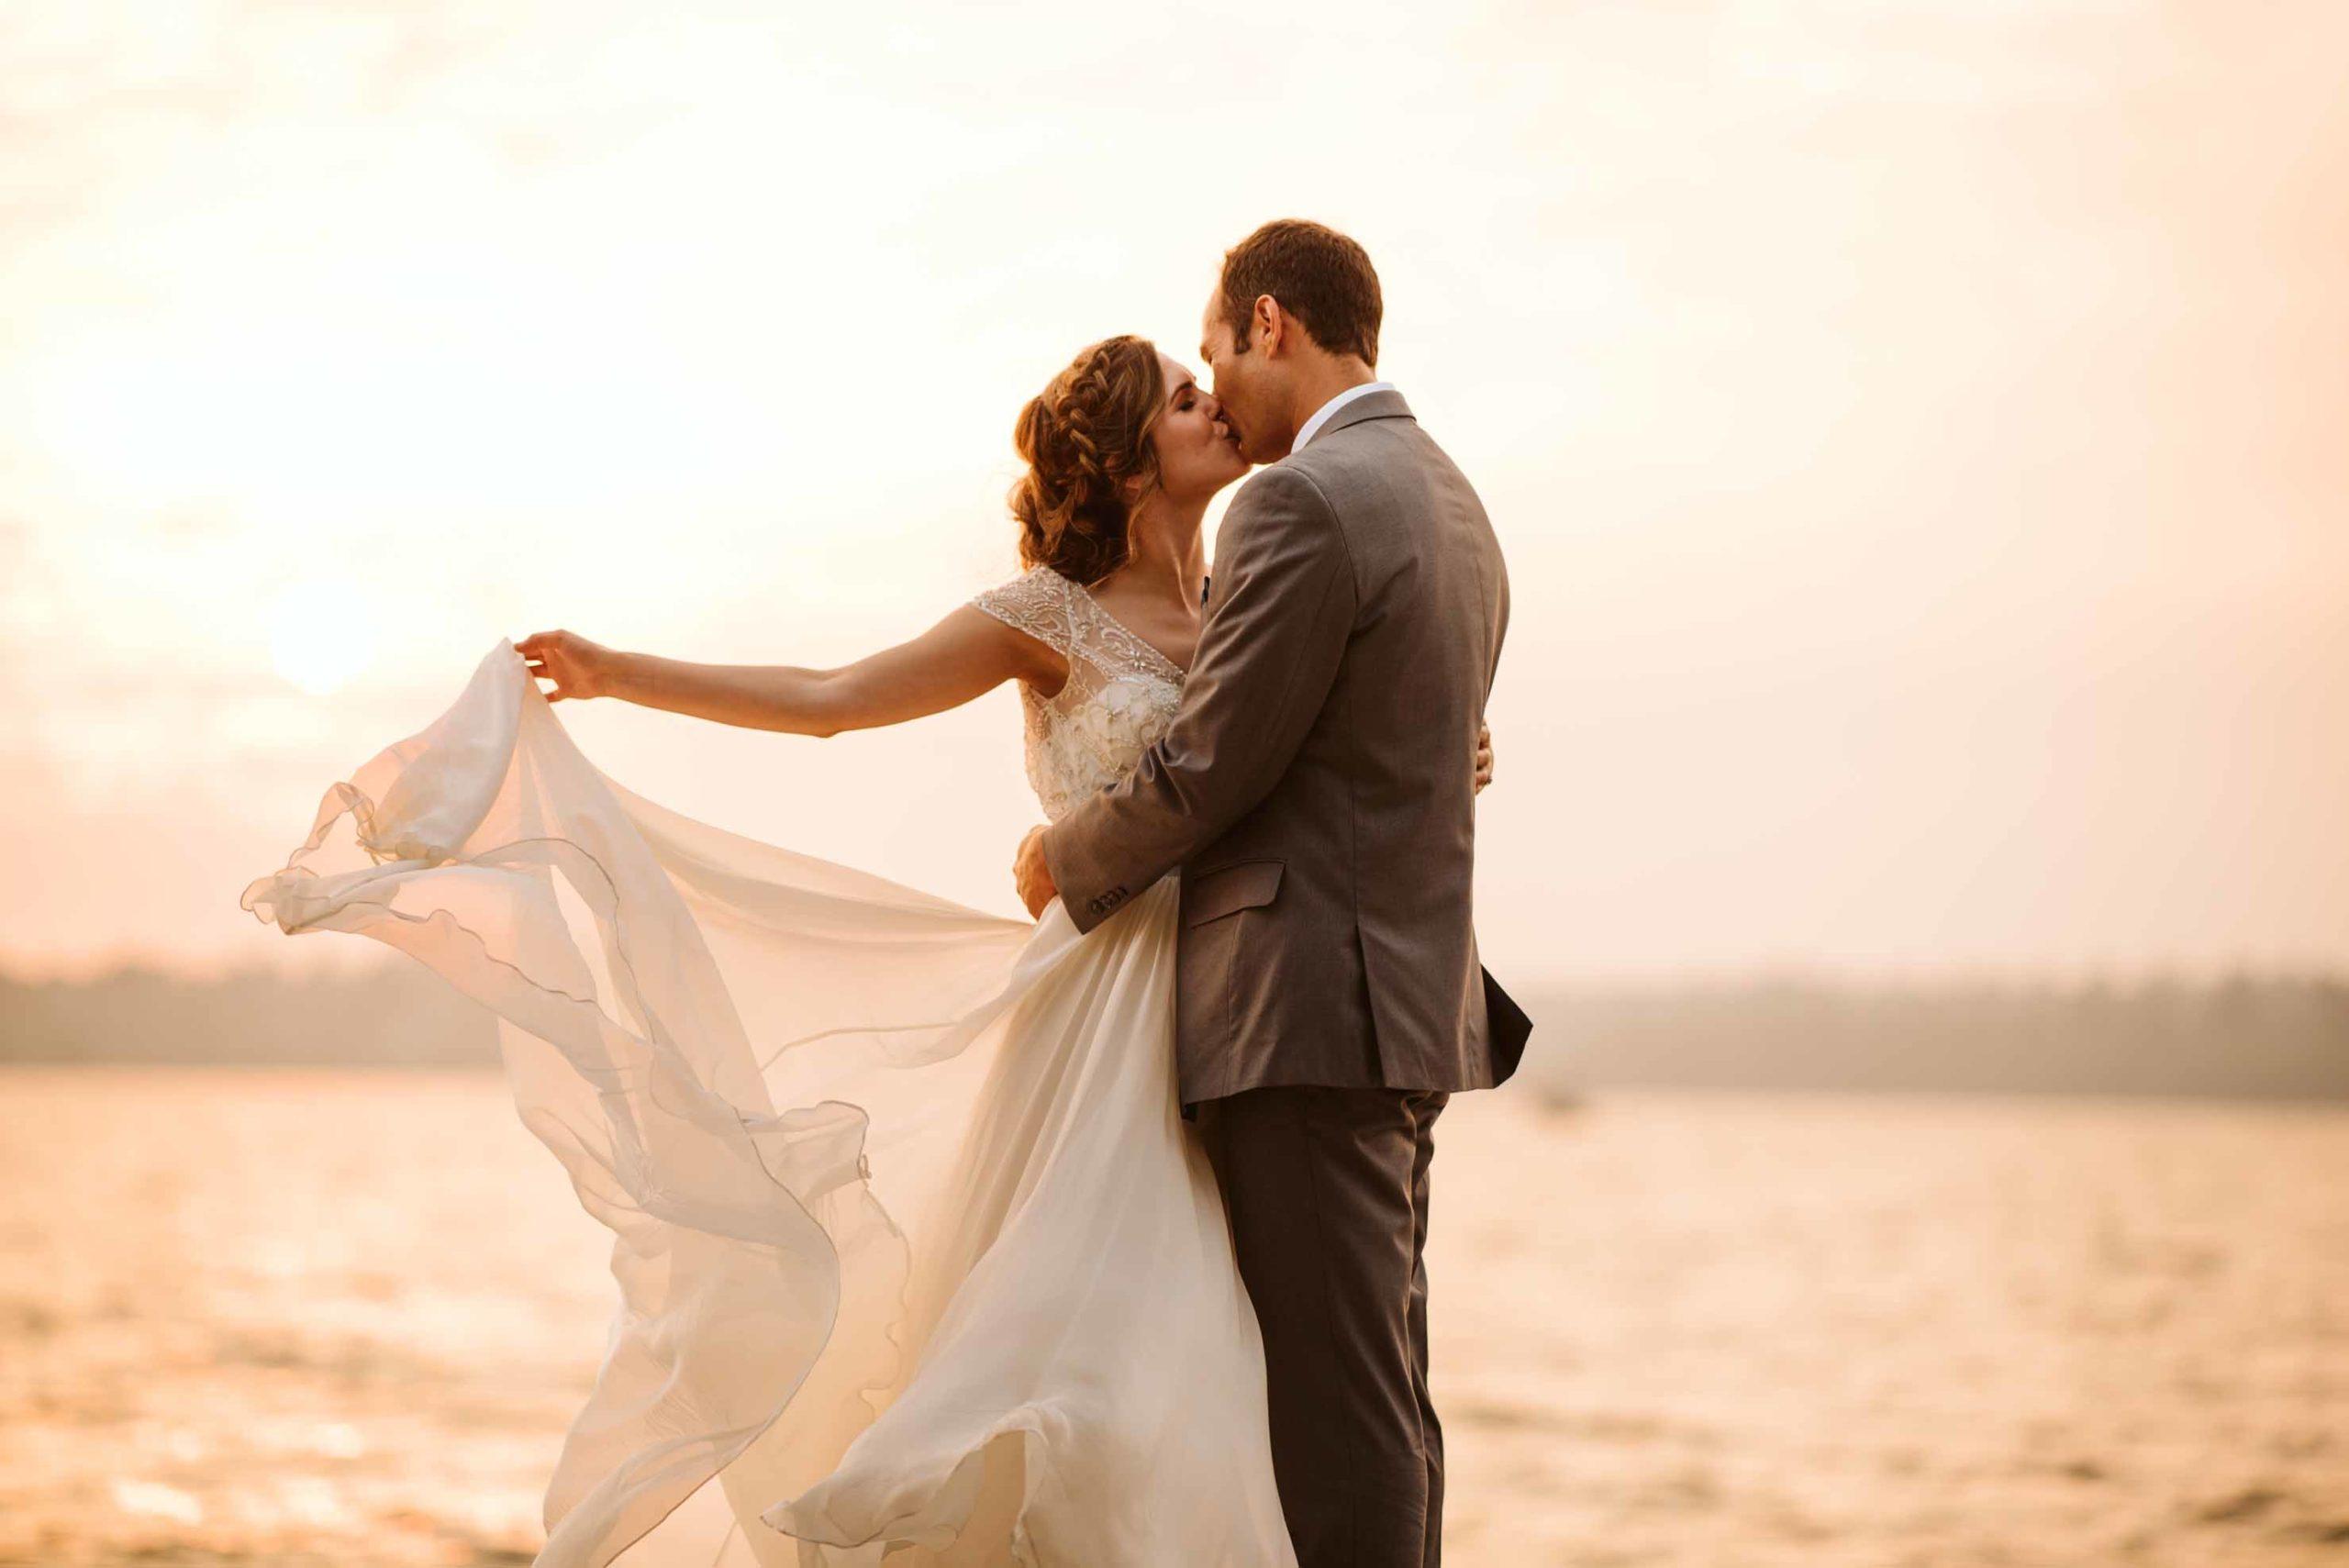 Romantic sunset kiss between bride and groom beside Lake Washington